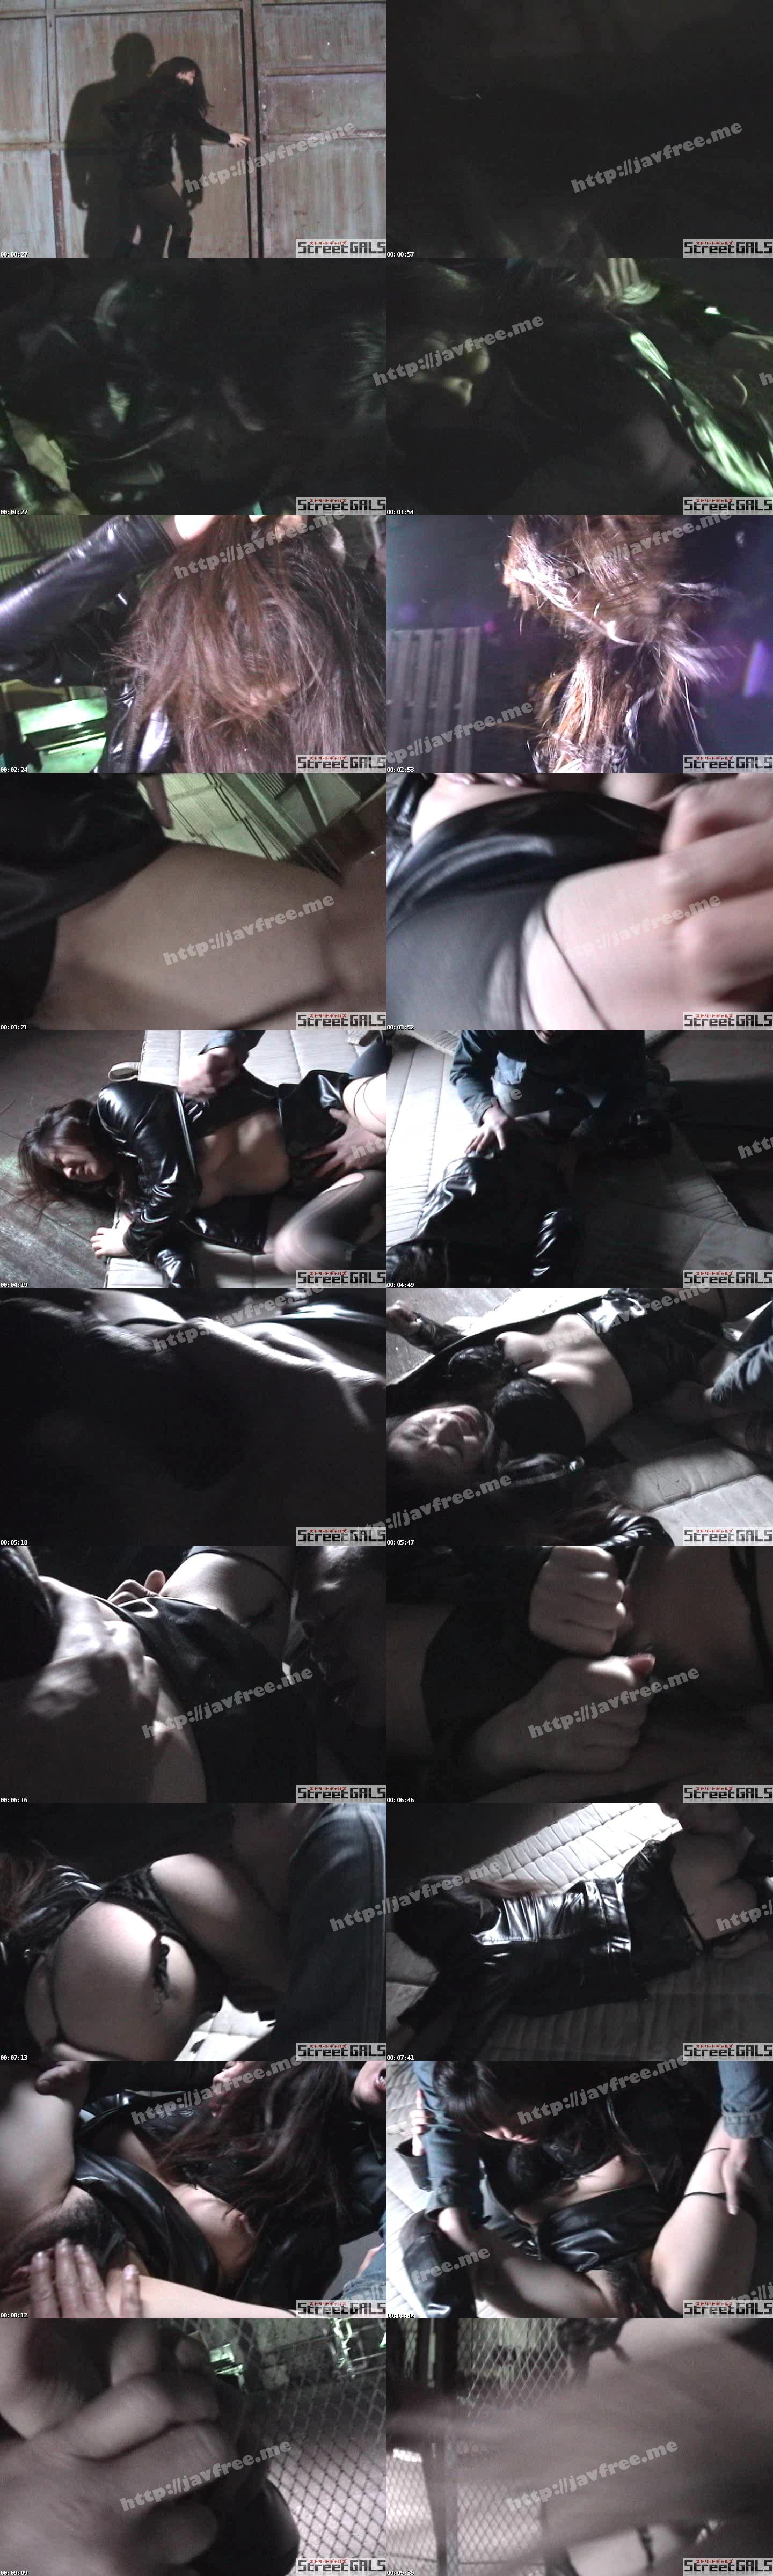 XXX AV 22130 ストリートギャルズ提供作品 2011年10月24日 廃工場にて…撮影者不明の禁断映像 XXX AV